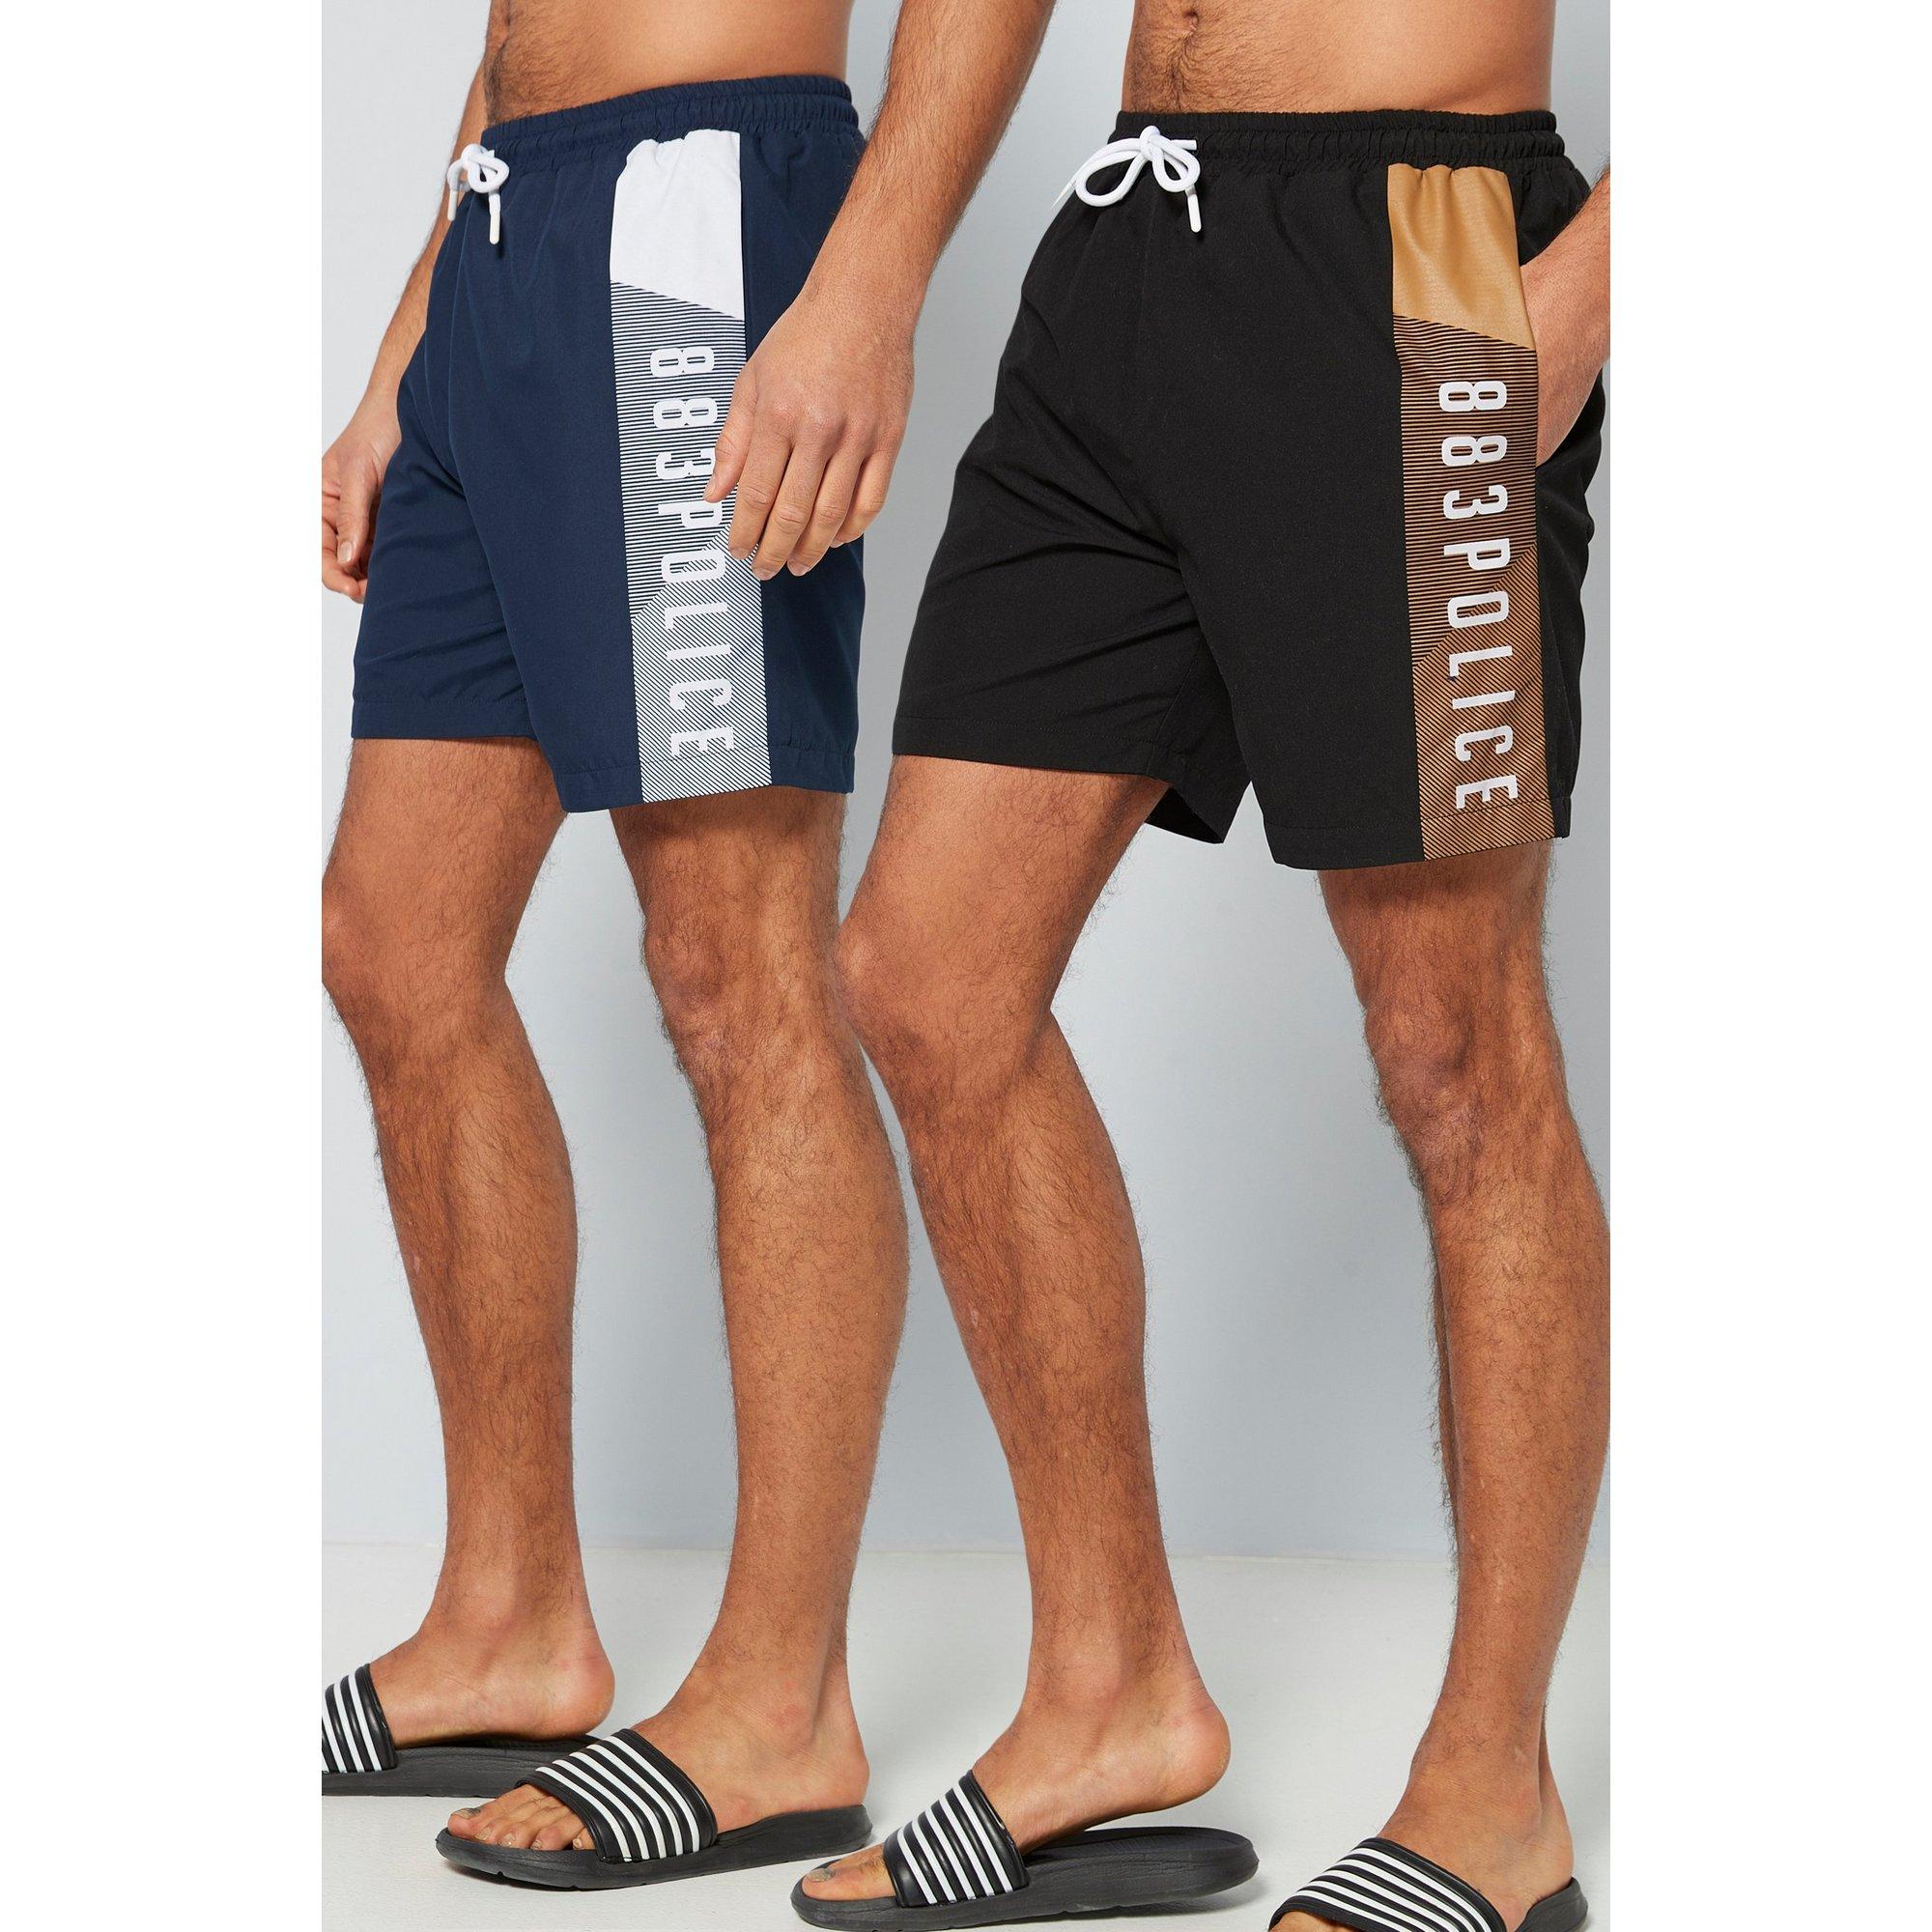 Image of 883 Police Pack of 2 Black/Navy Swim Shorts